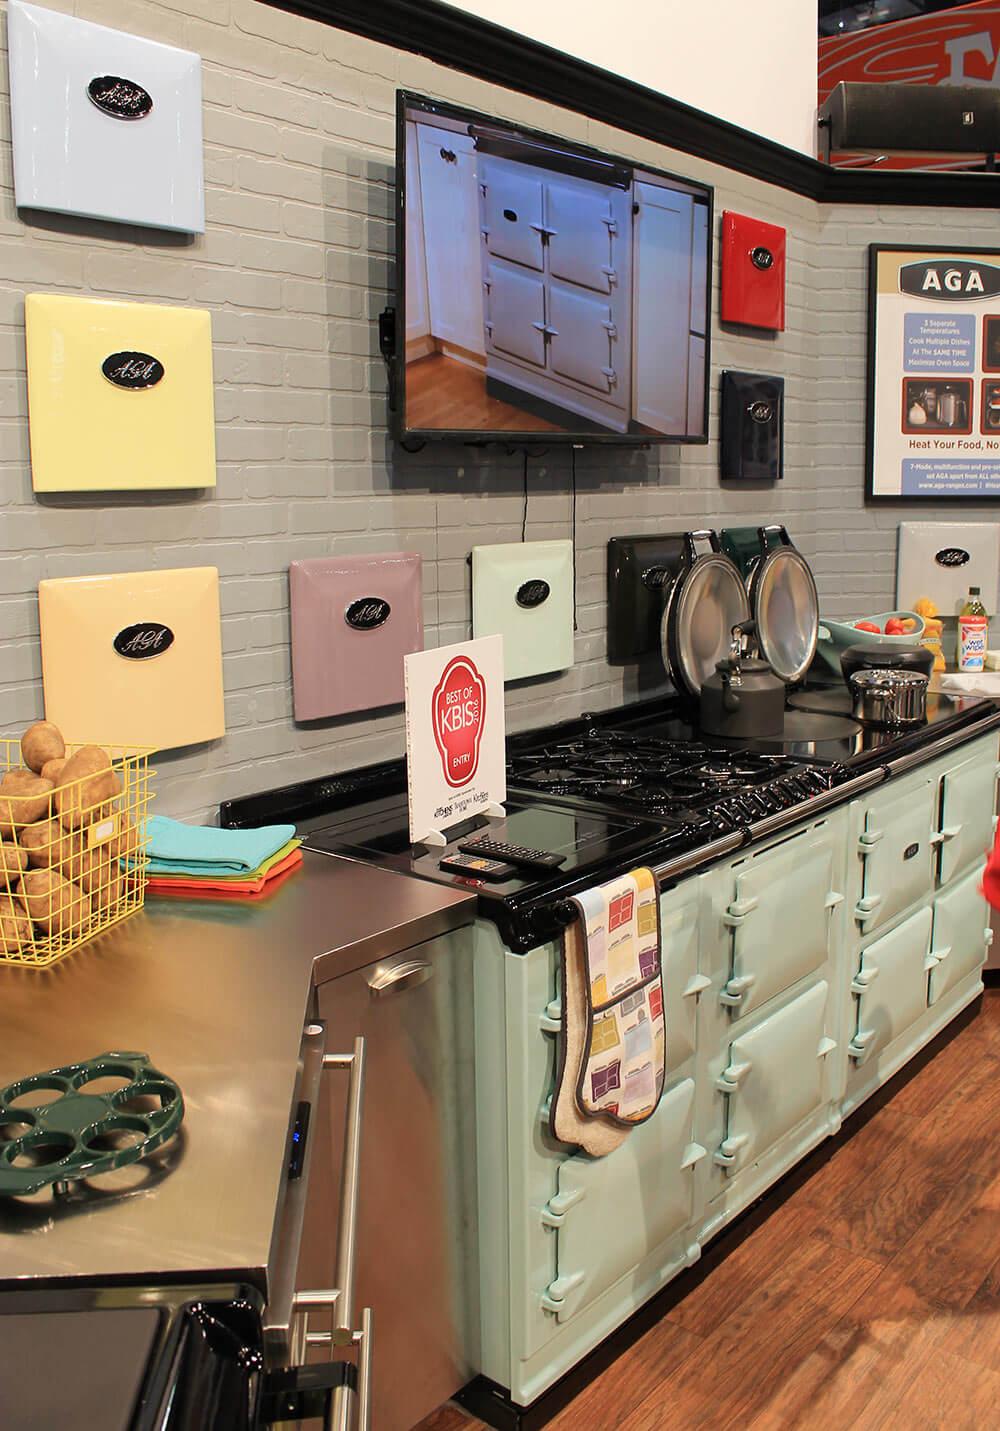 Retro Renovation Kitchen Aga Colorful Ranges And A Retro Kitchen At Kbis Retro Renovation